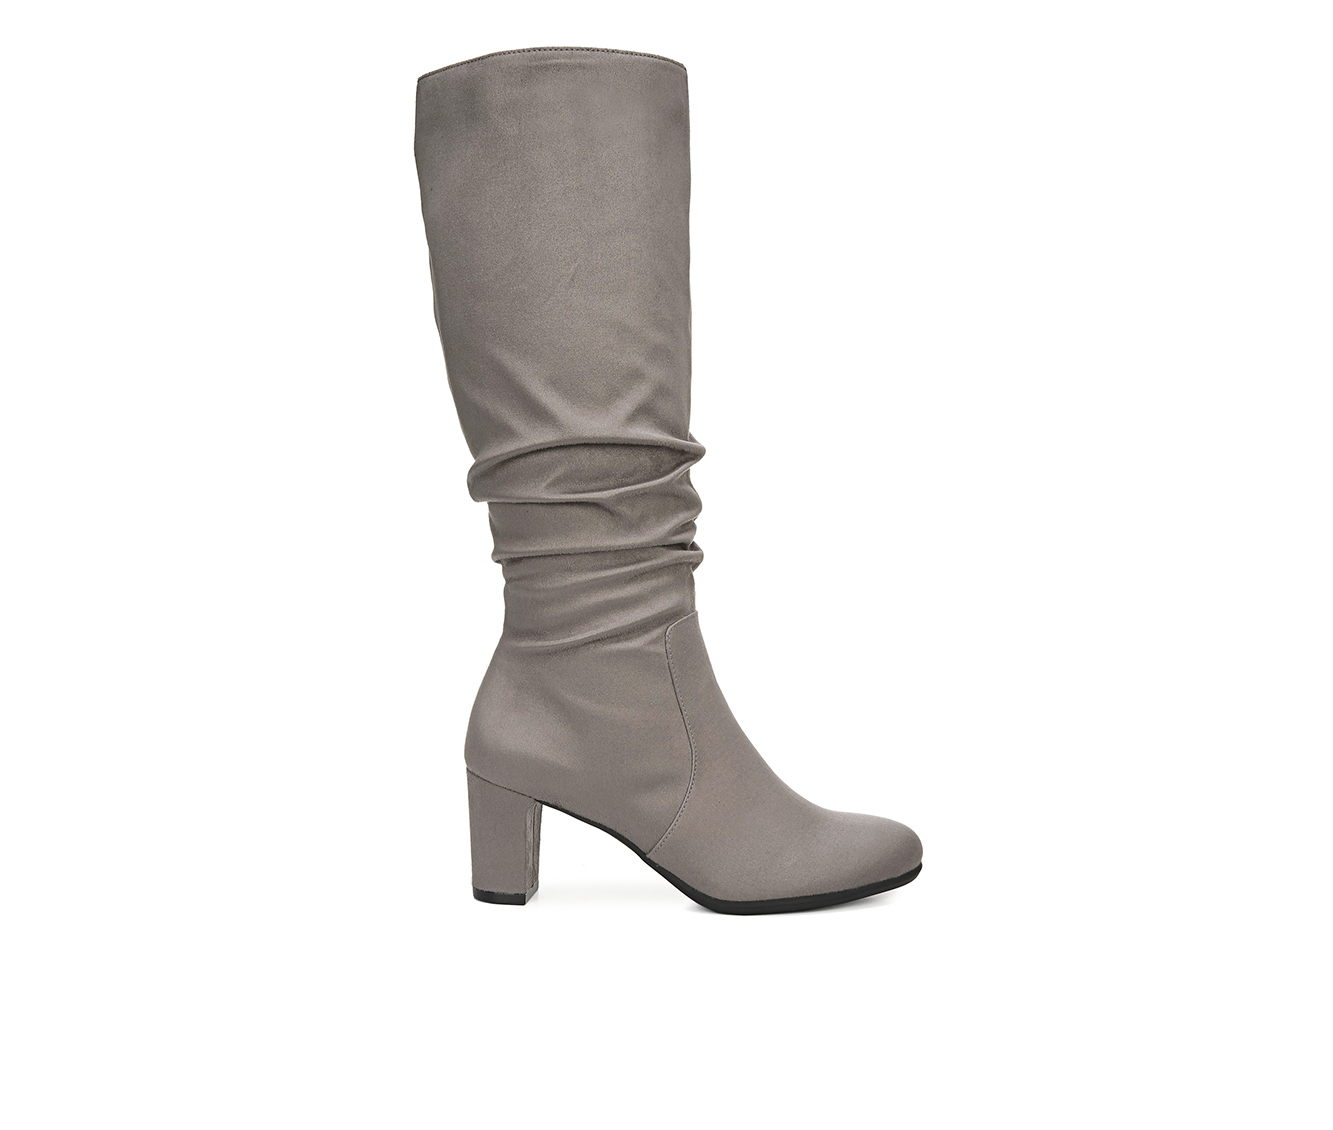 LifeStride Maltese Wide Calf Women's Boots (Gray - Canvas)